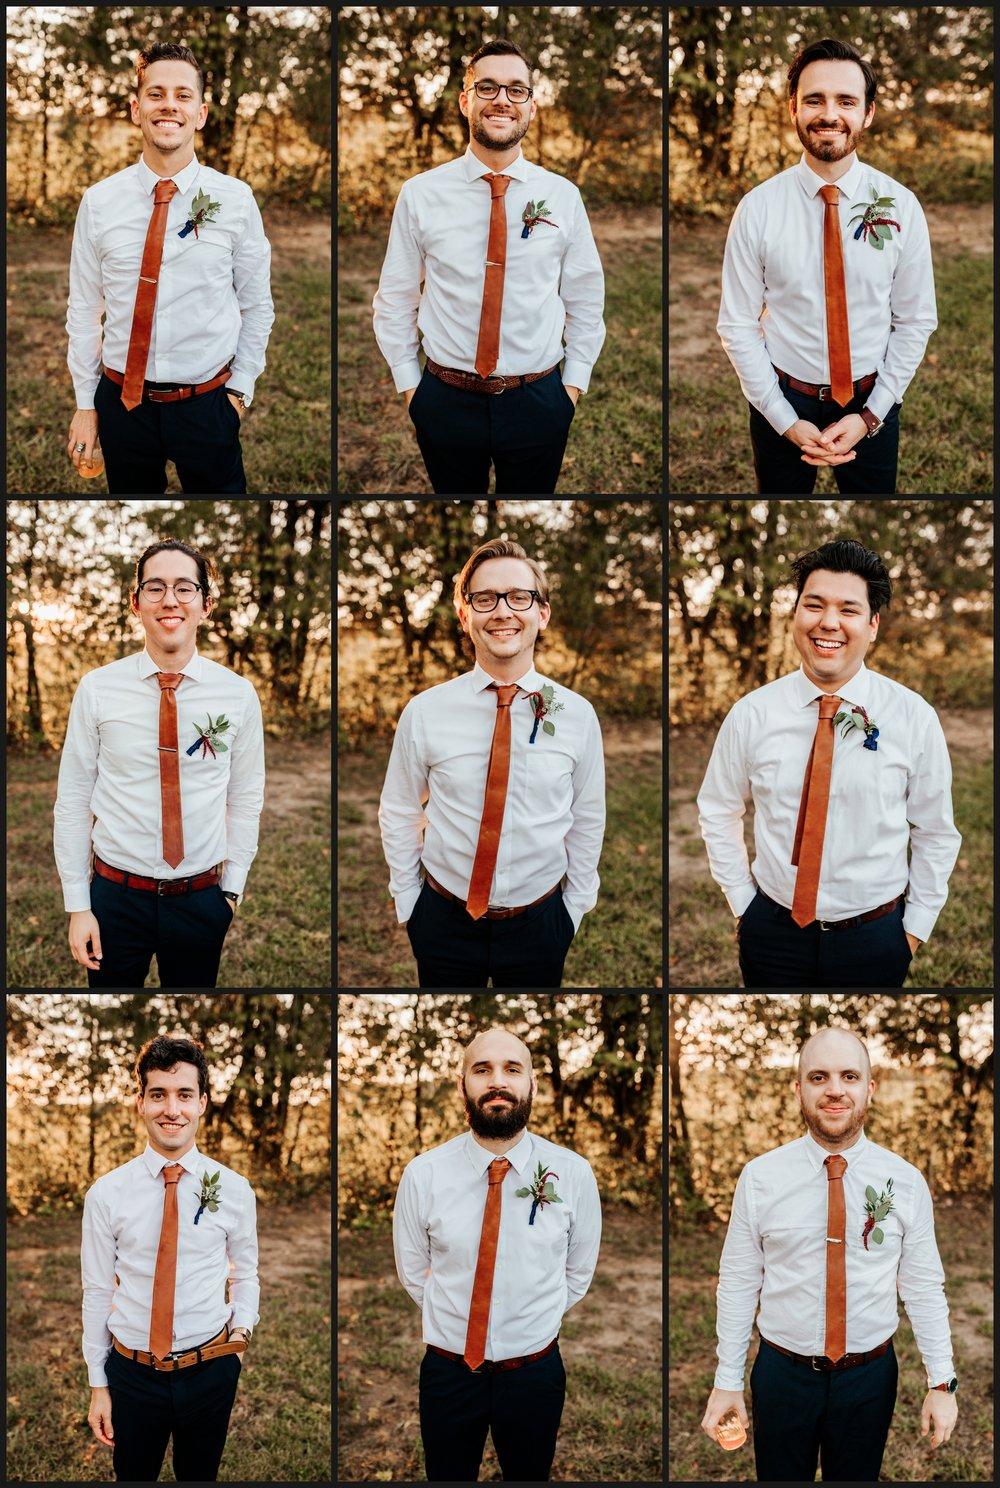 Orlando-Wedding-Photographer-destination-wedding-photographer-florida-wedding-photographer-bohemian-wedding-photographer_0099.jpg